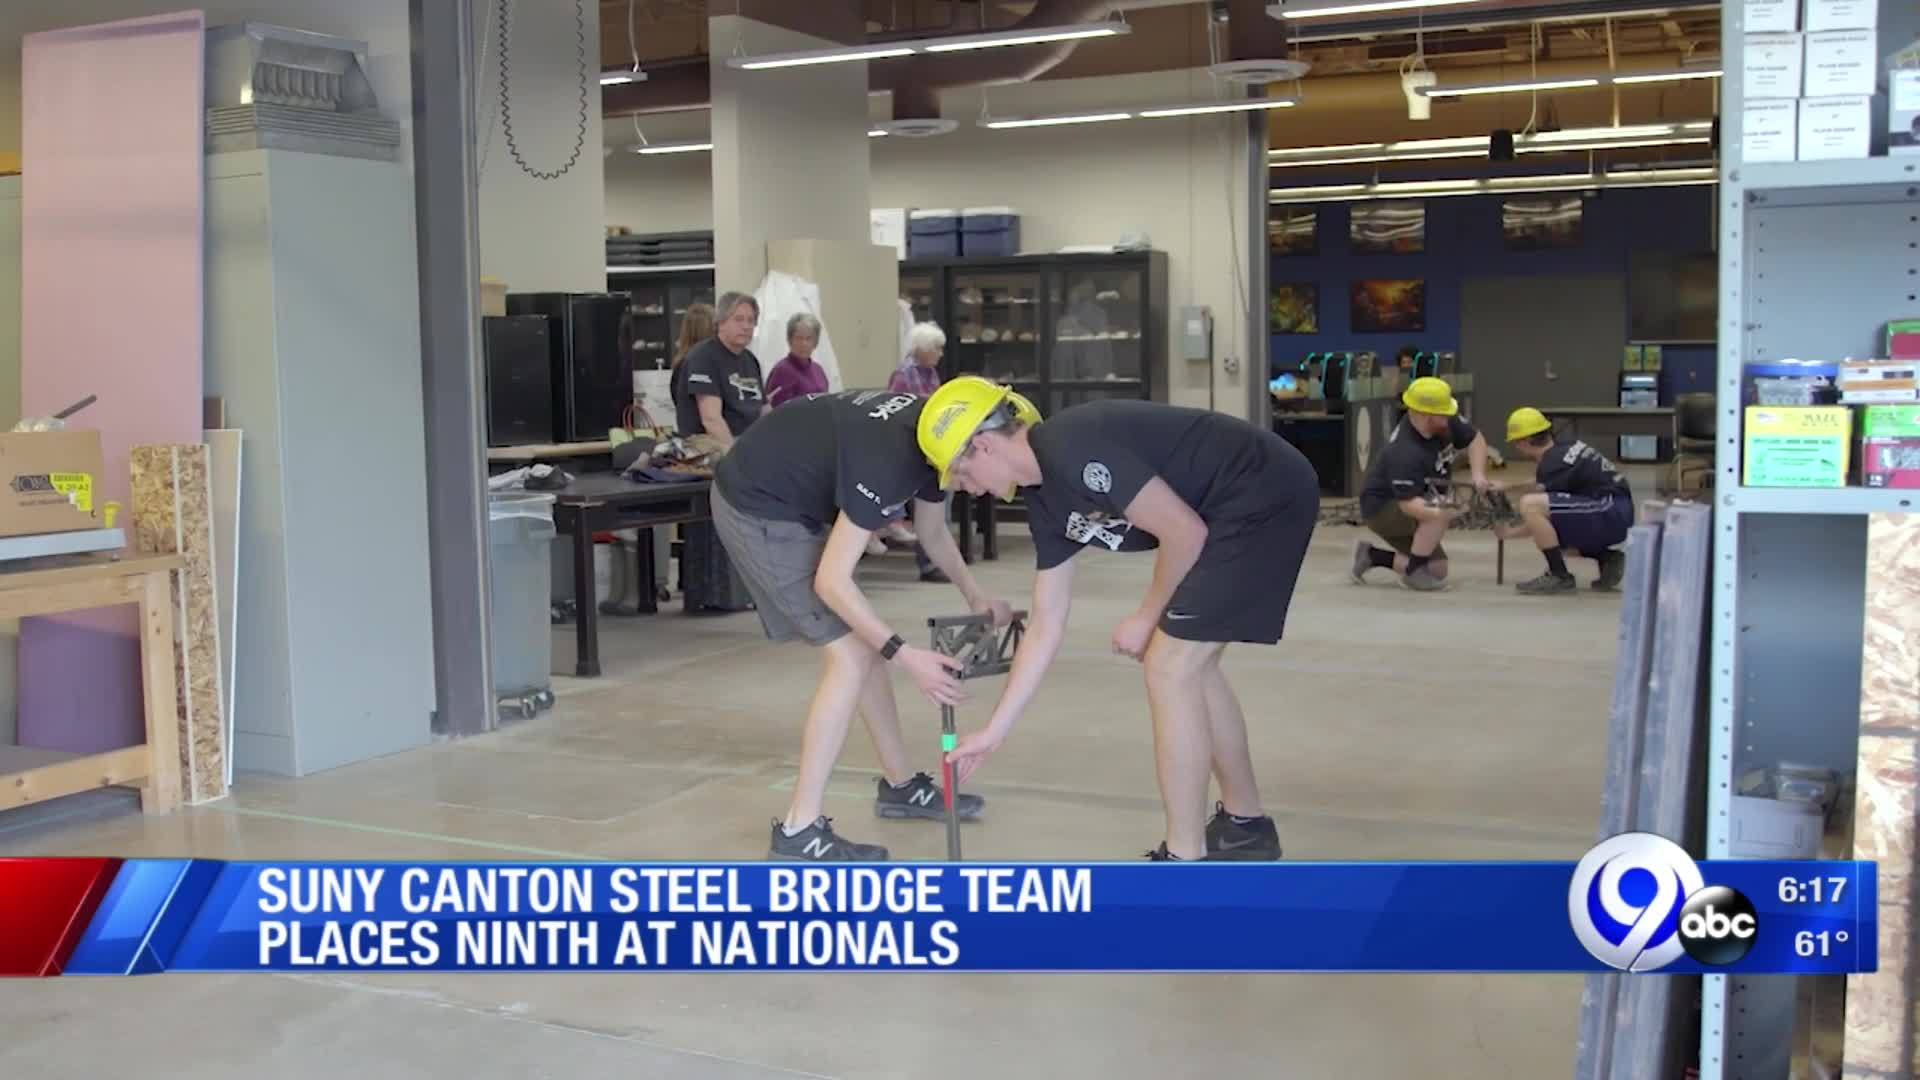 SUNY_Canton_Steel_Bridge_Team_places_9th_7_20190603222914